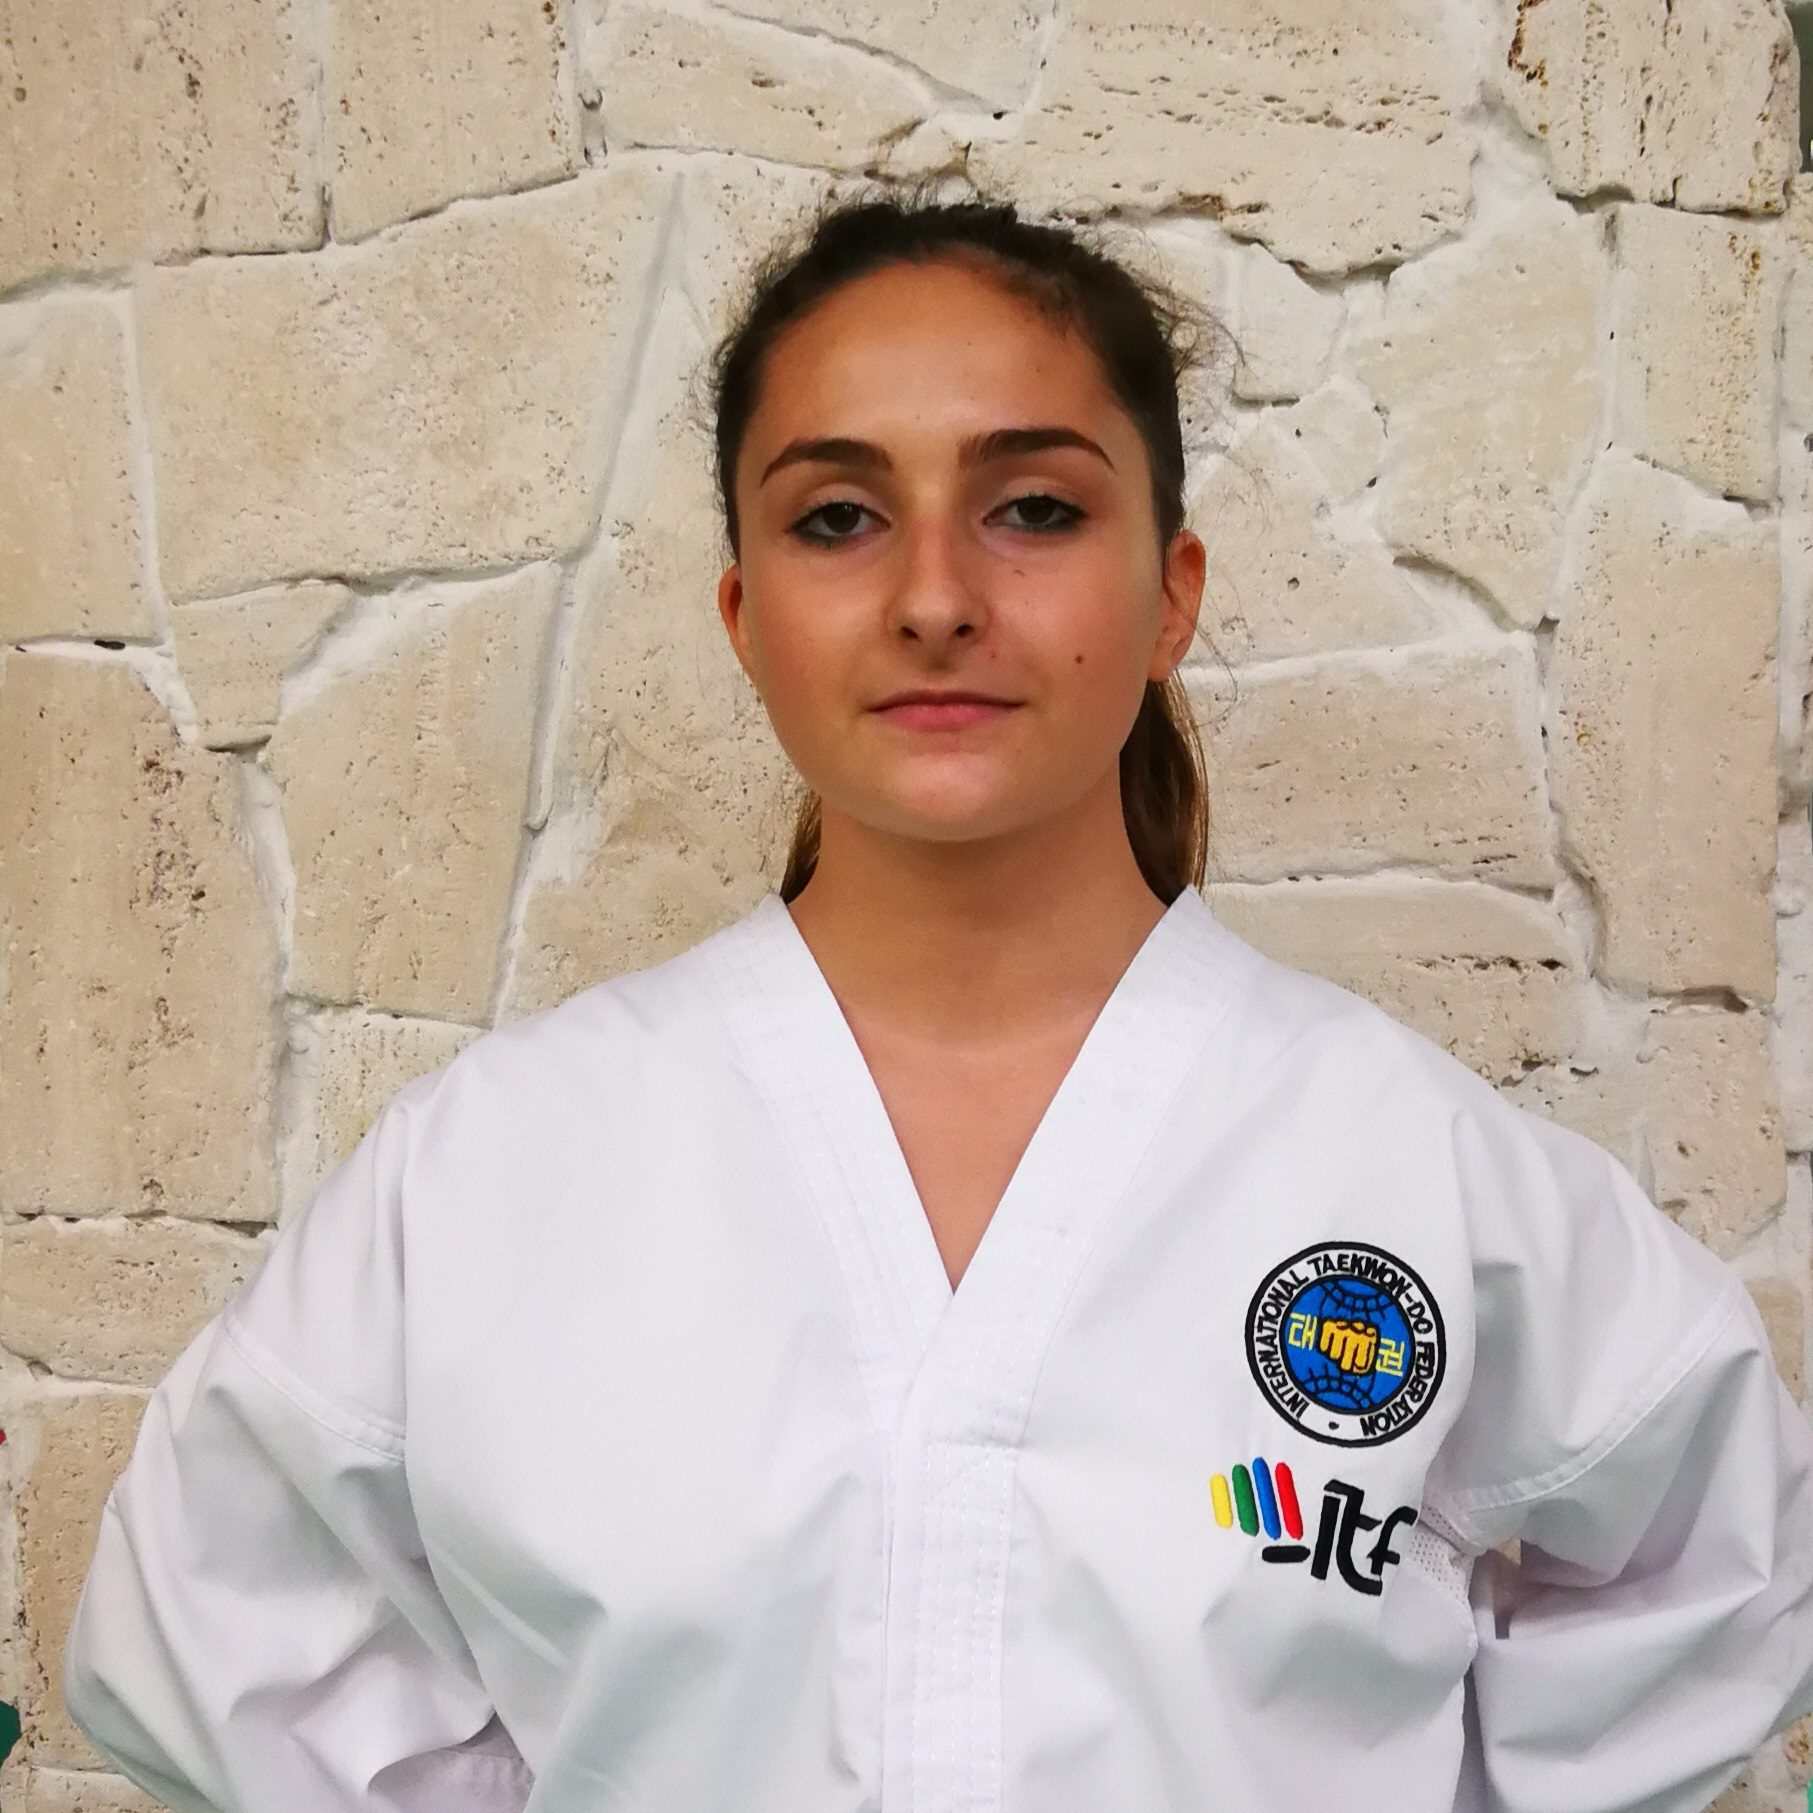 Elisa Cadoni